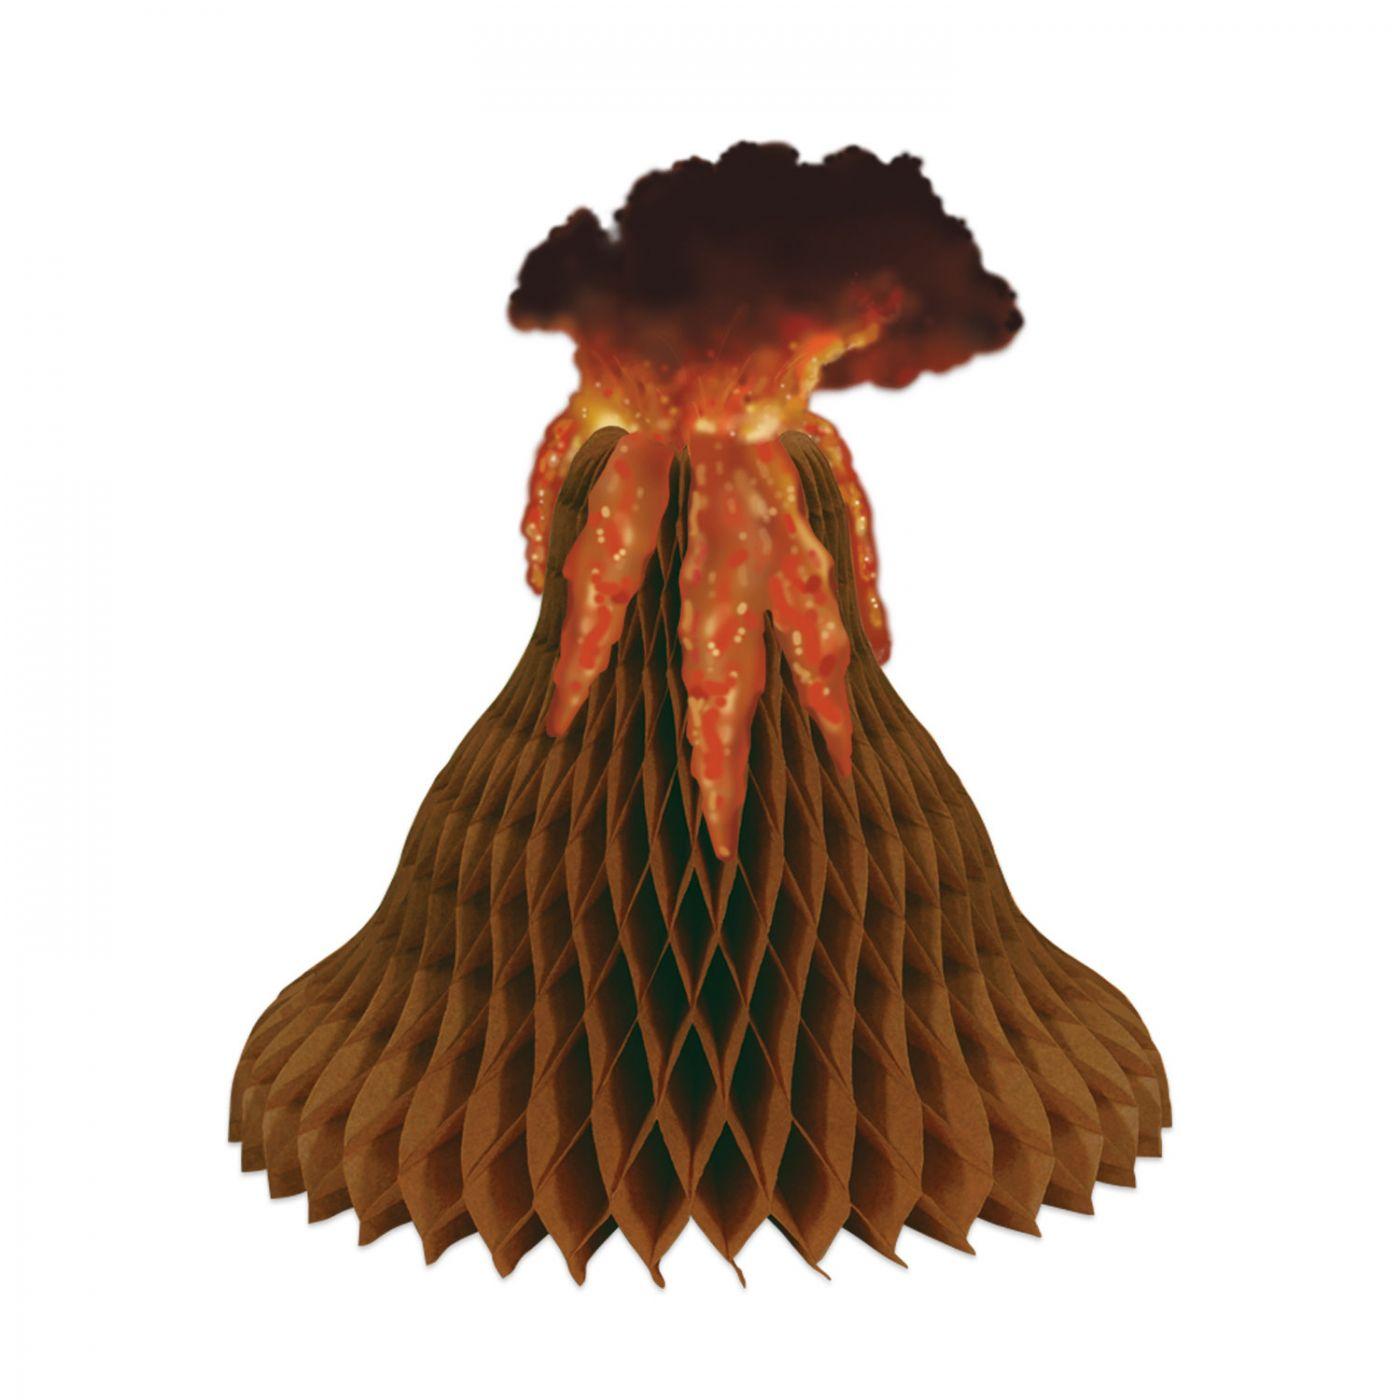 Tissue Volcano Centerpiece image